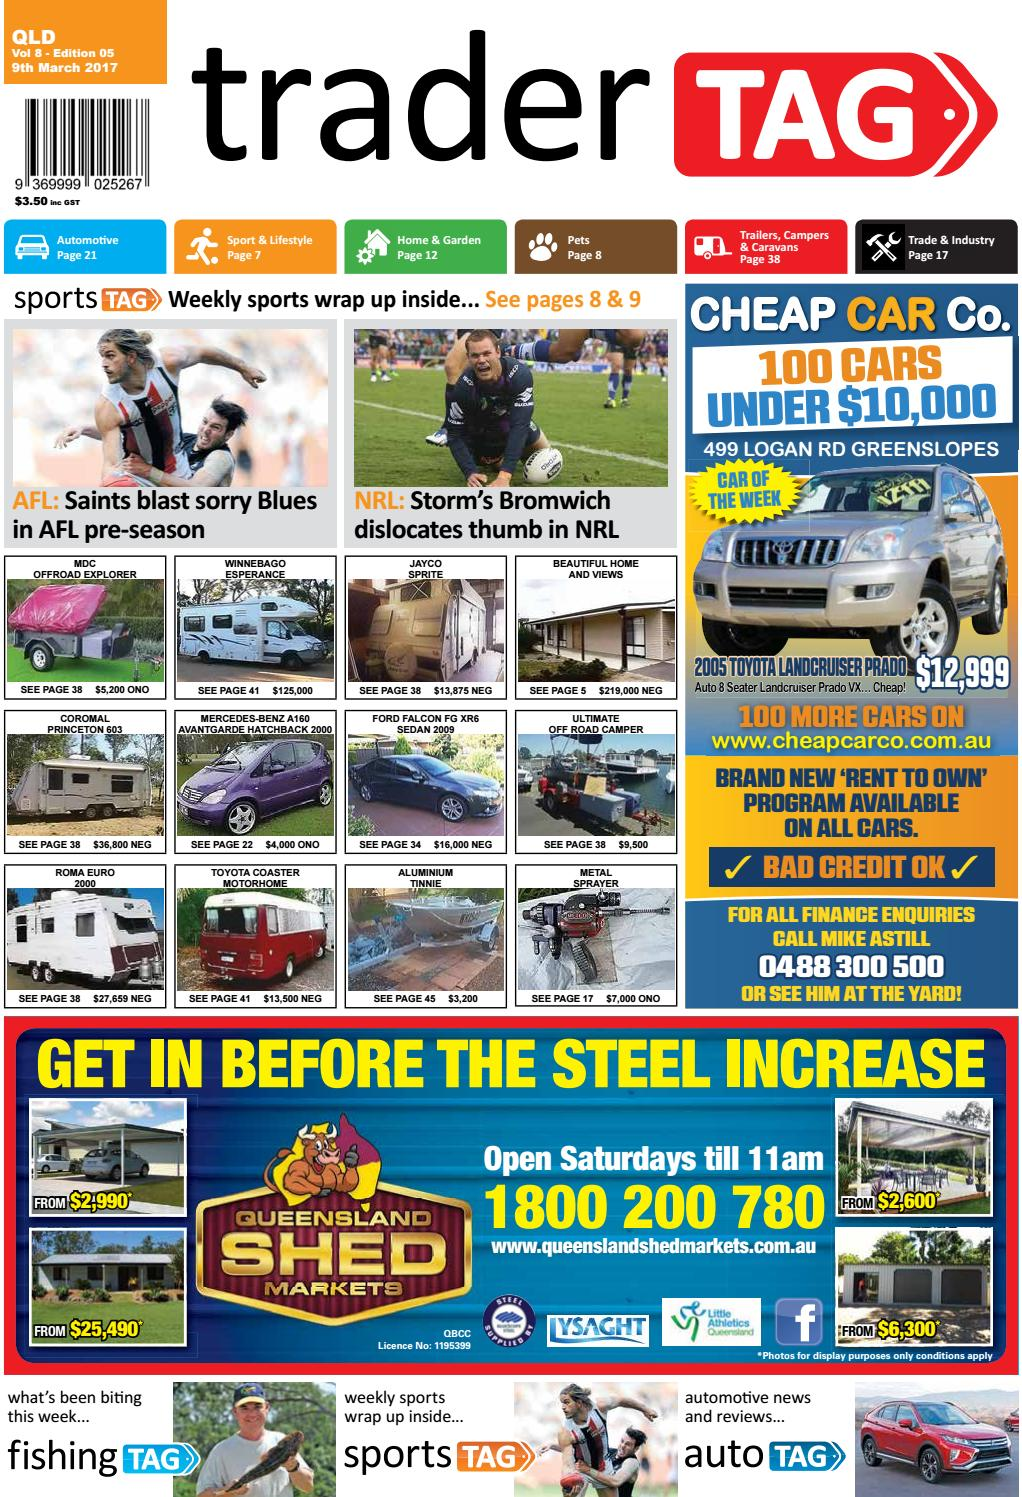 Tradertag Queensland Edition 05 2017 By Design Issuu Inside Flats Caprice Black Hitam 37